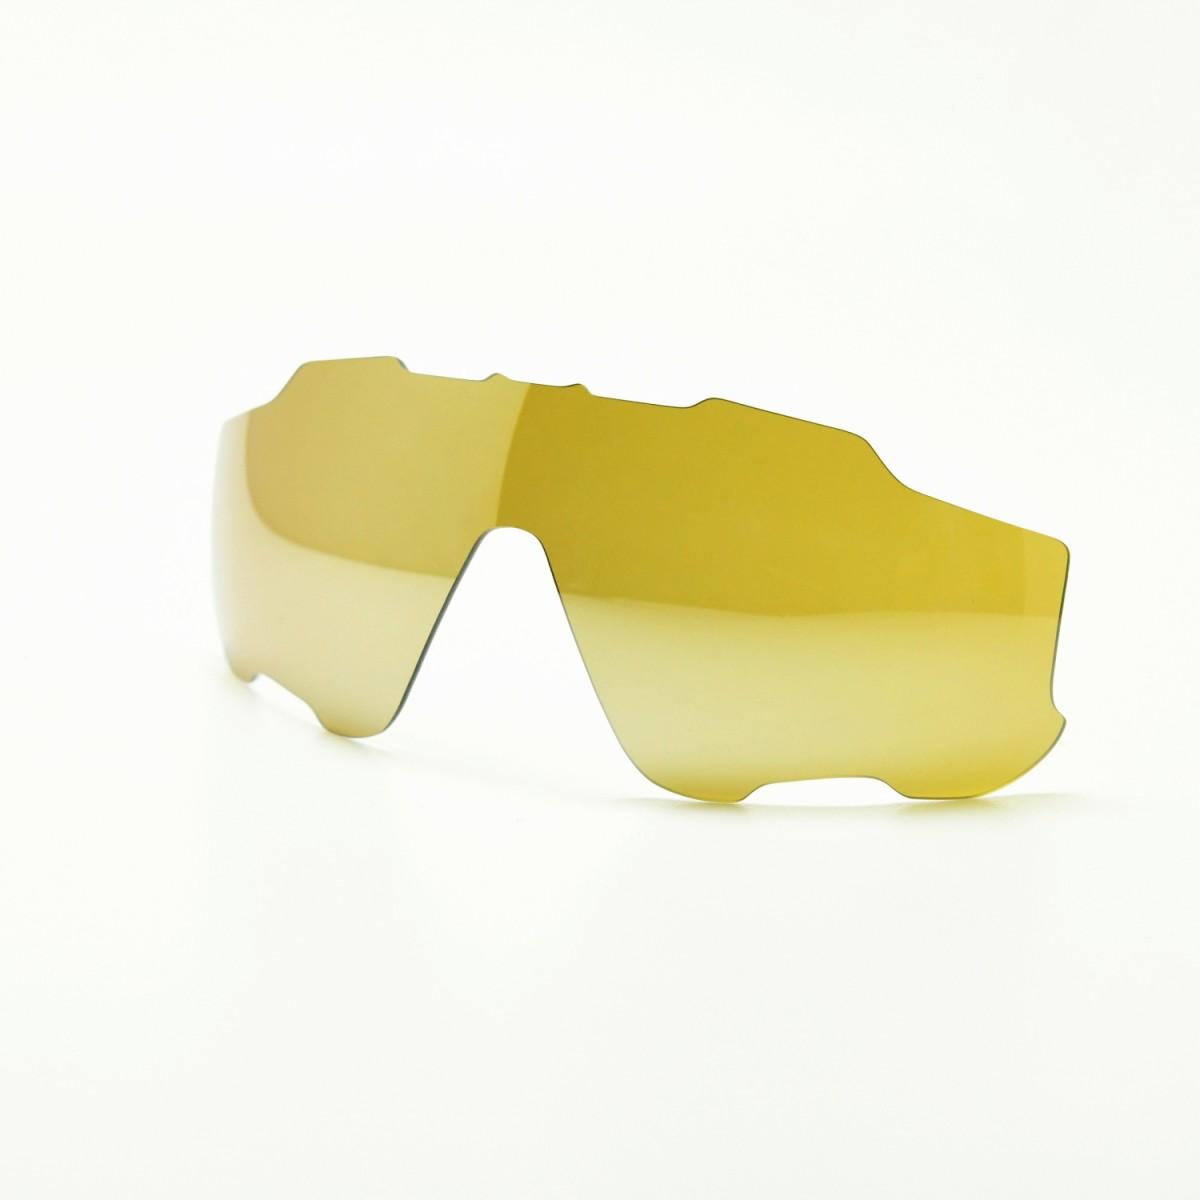 GOODMAN LENS MANUFACTURE グッドマンレンズマニュファクチューOAKLEY JAWBREAKER オークリー ジョーブレーカー用交換レンズ偏光イエロー シルバーミラー ※レンズのみ